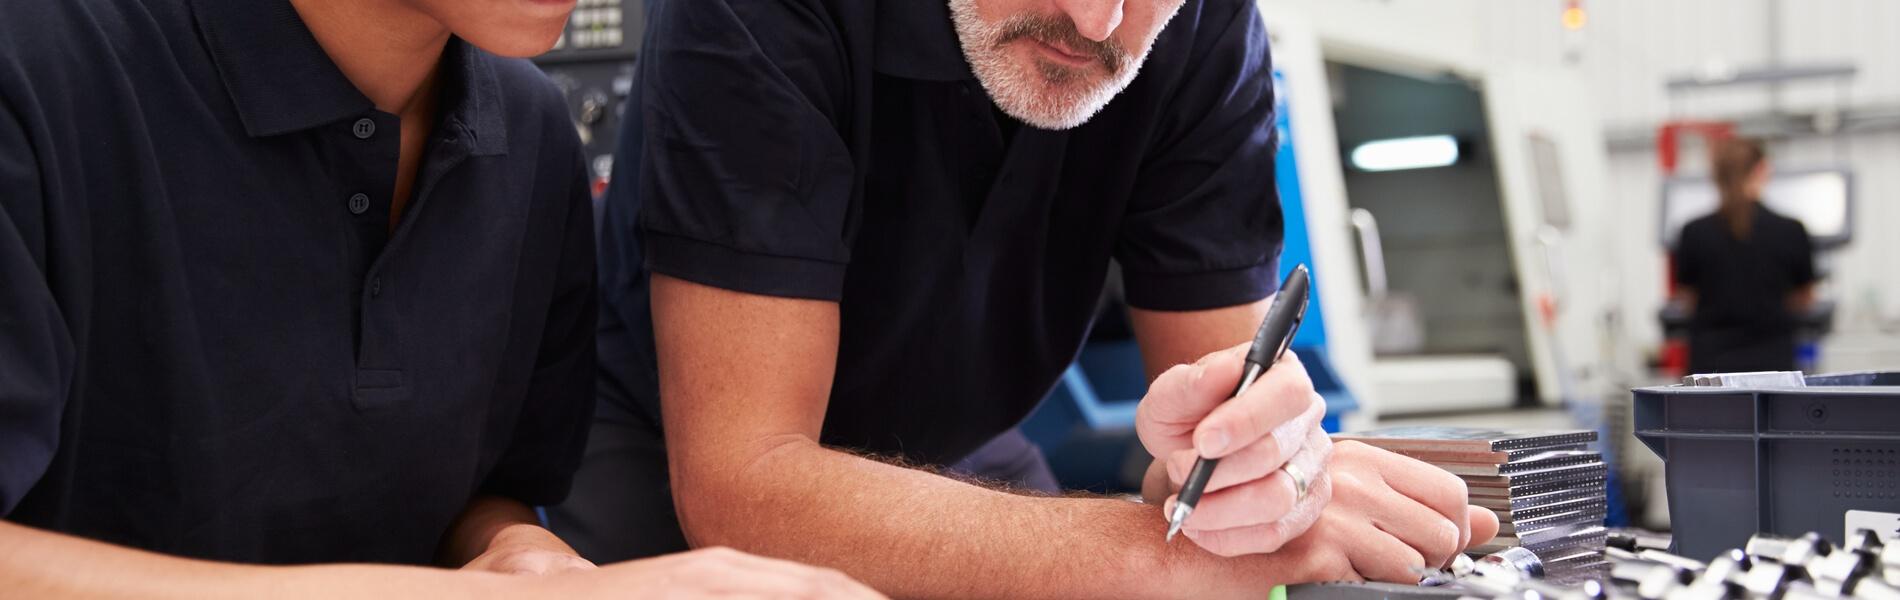 uk-manufacturing-skills-gap-apprenticeship-levy.jpg